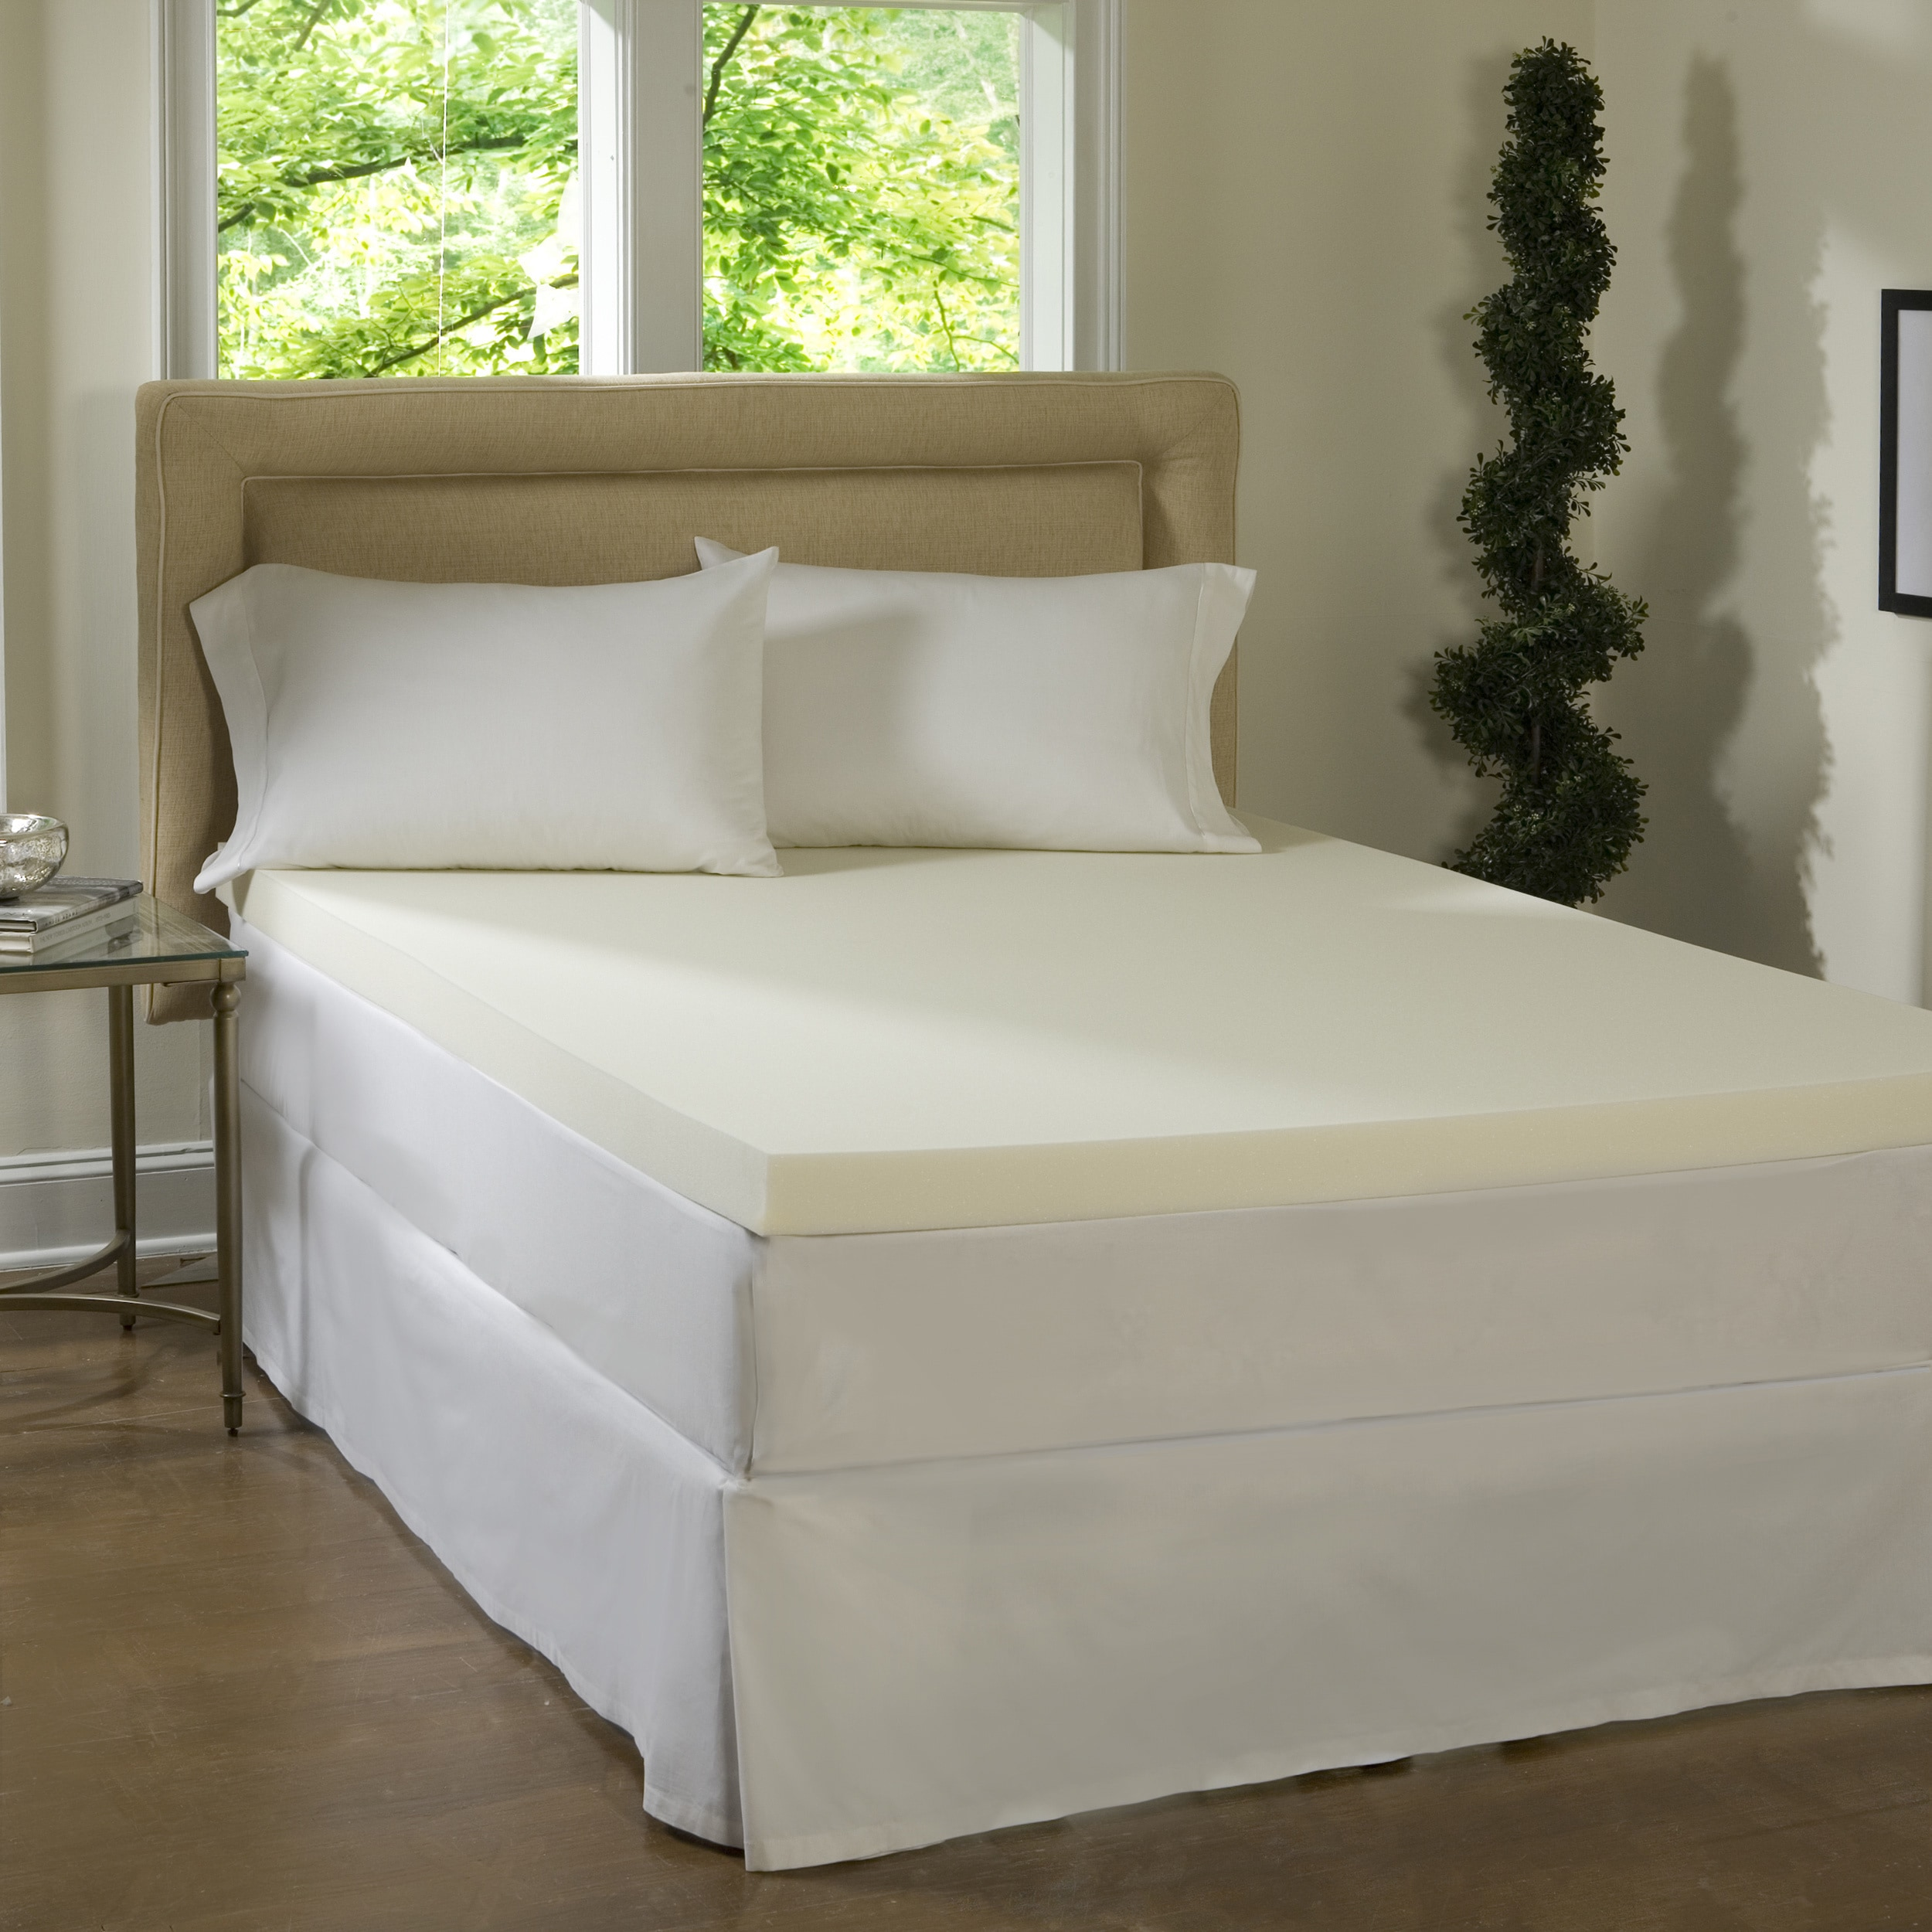 elegant stock of cheap memory foam mattress topper